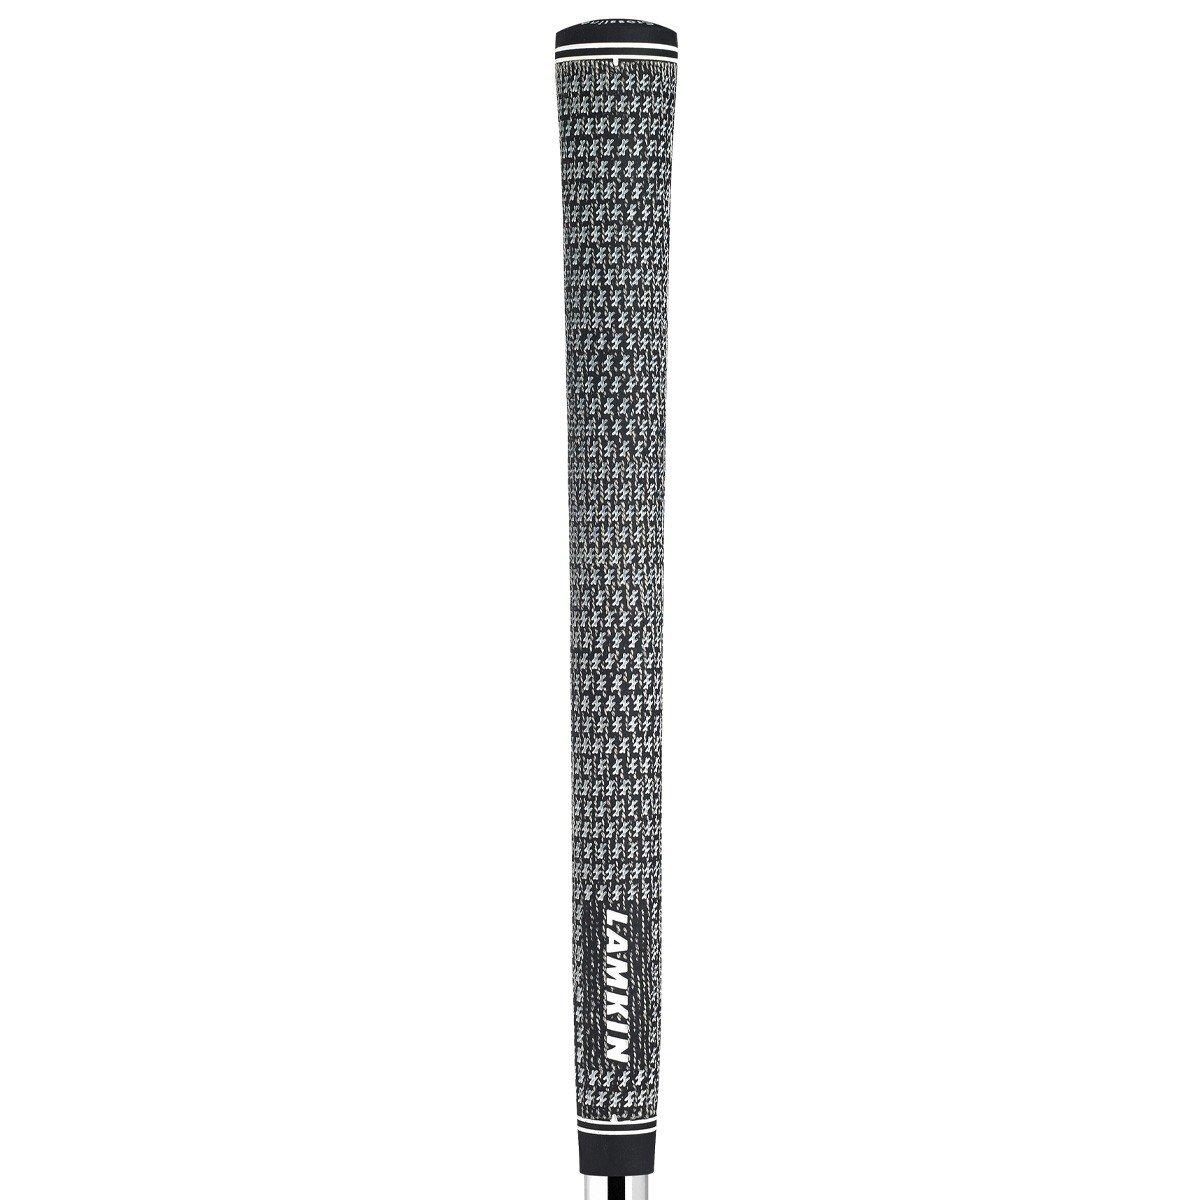 Lamkin Crossline cord Midsize (+1/16 Inch ) 13 Piece Golf Grip Bundle (